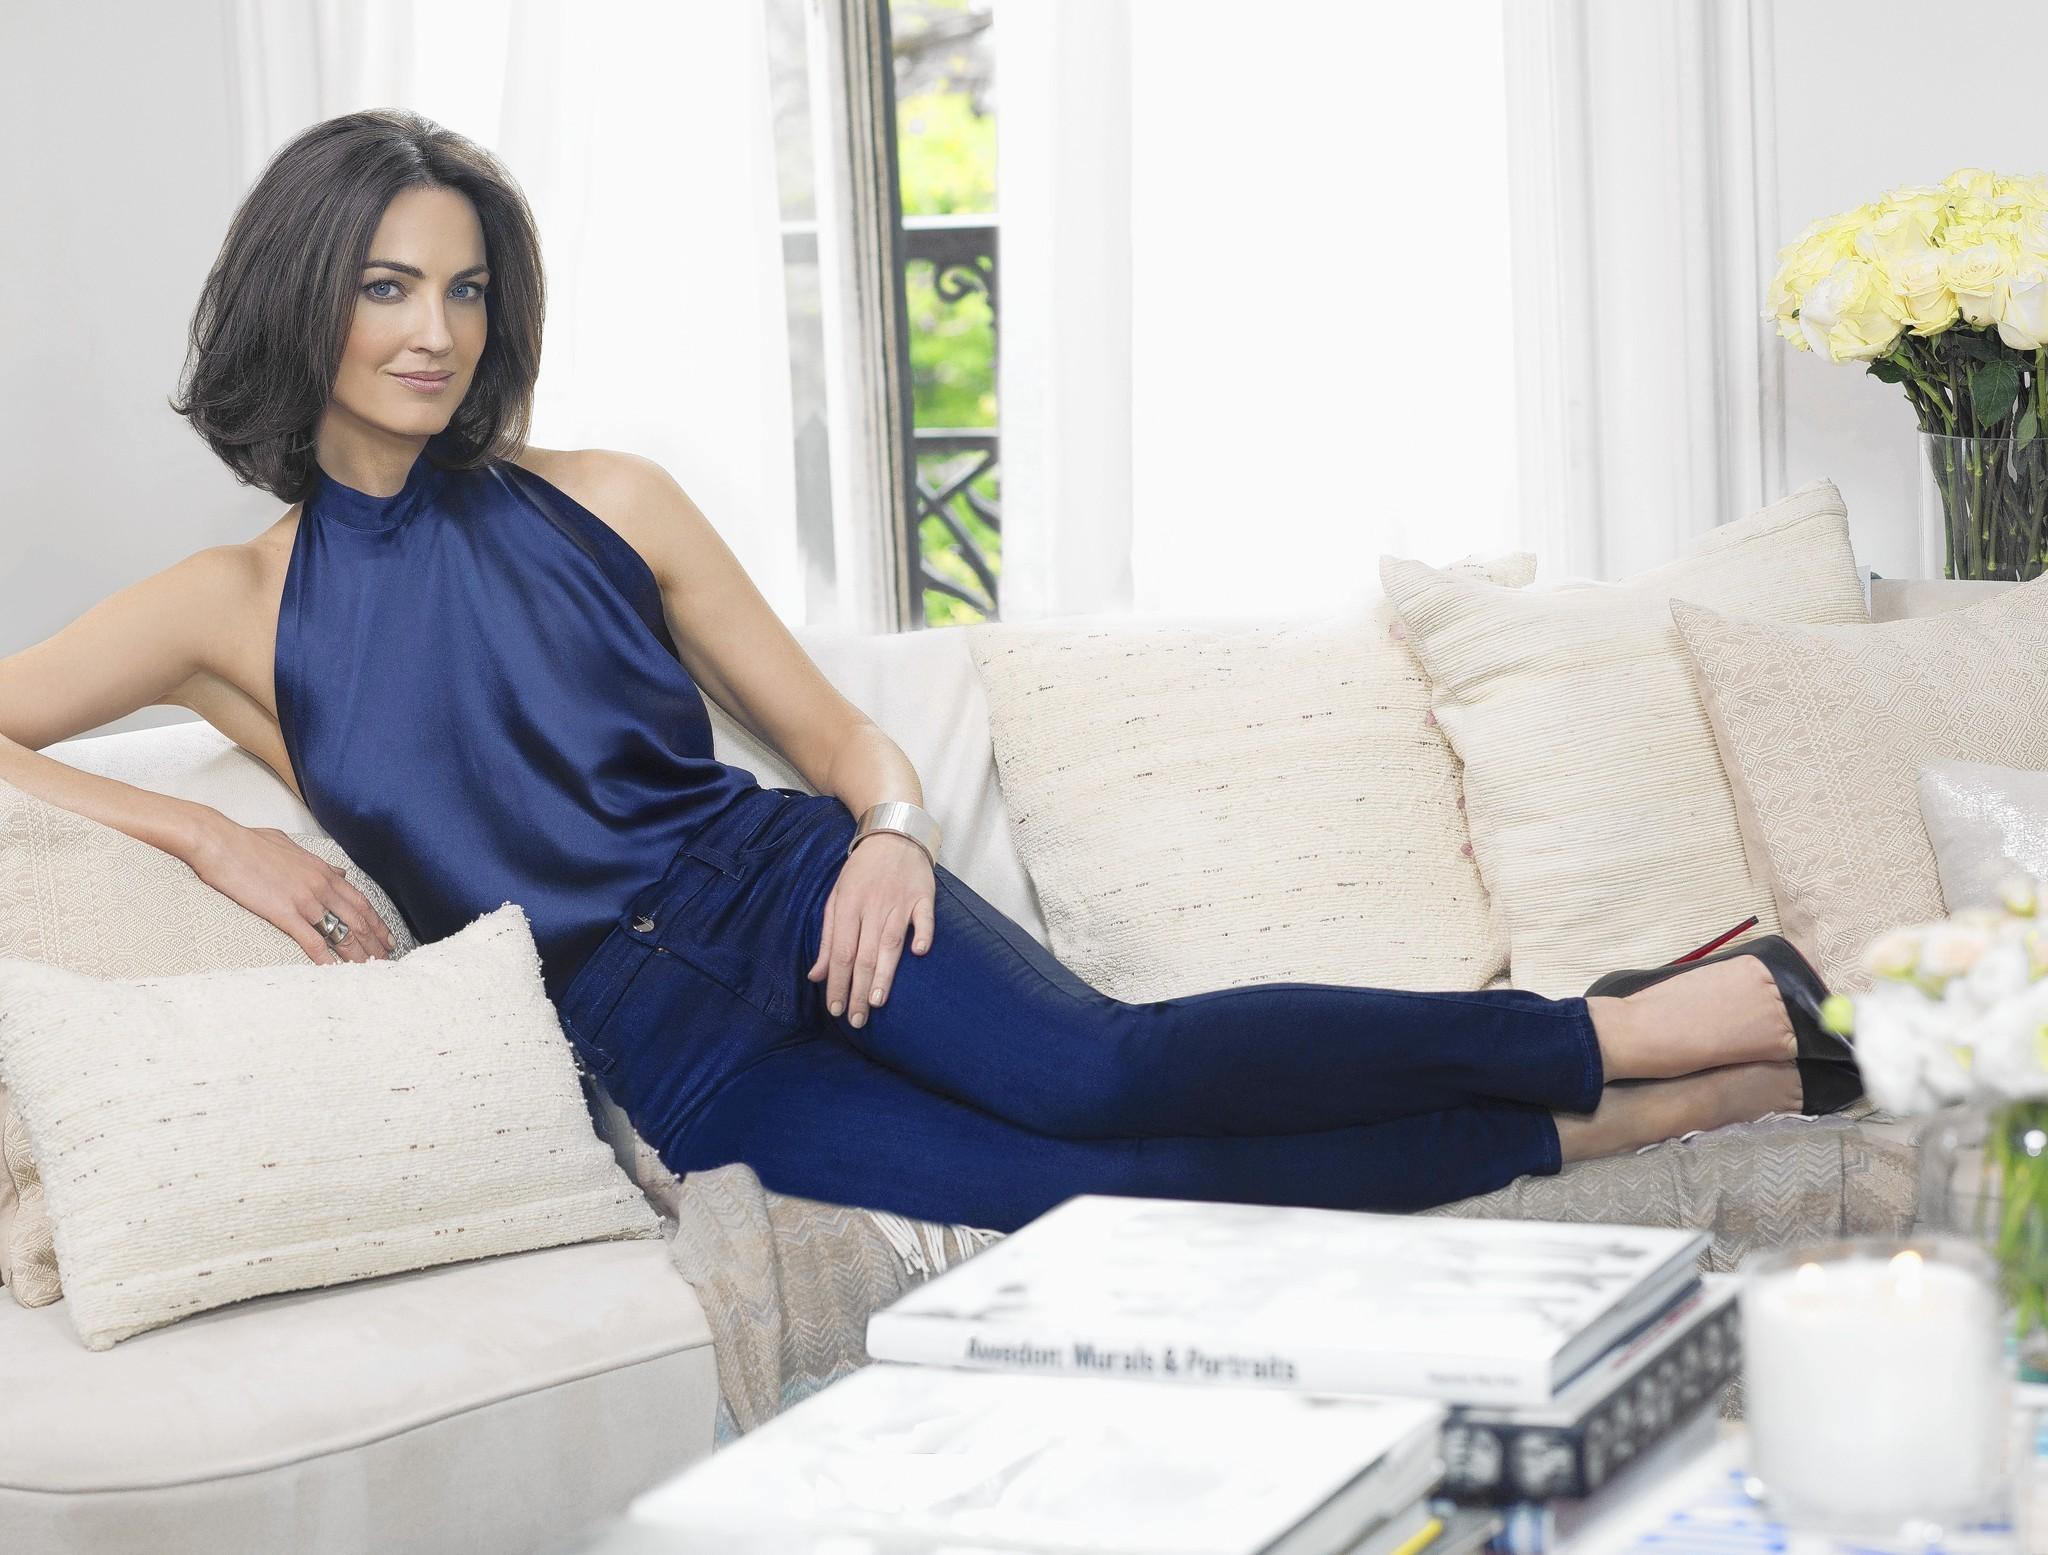 Jen7 Offers Premium Denim Tailored For Women In Their 40s